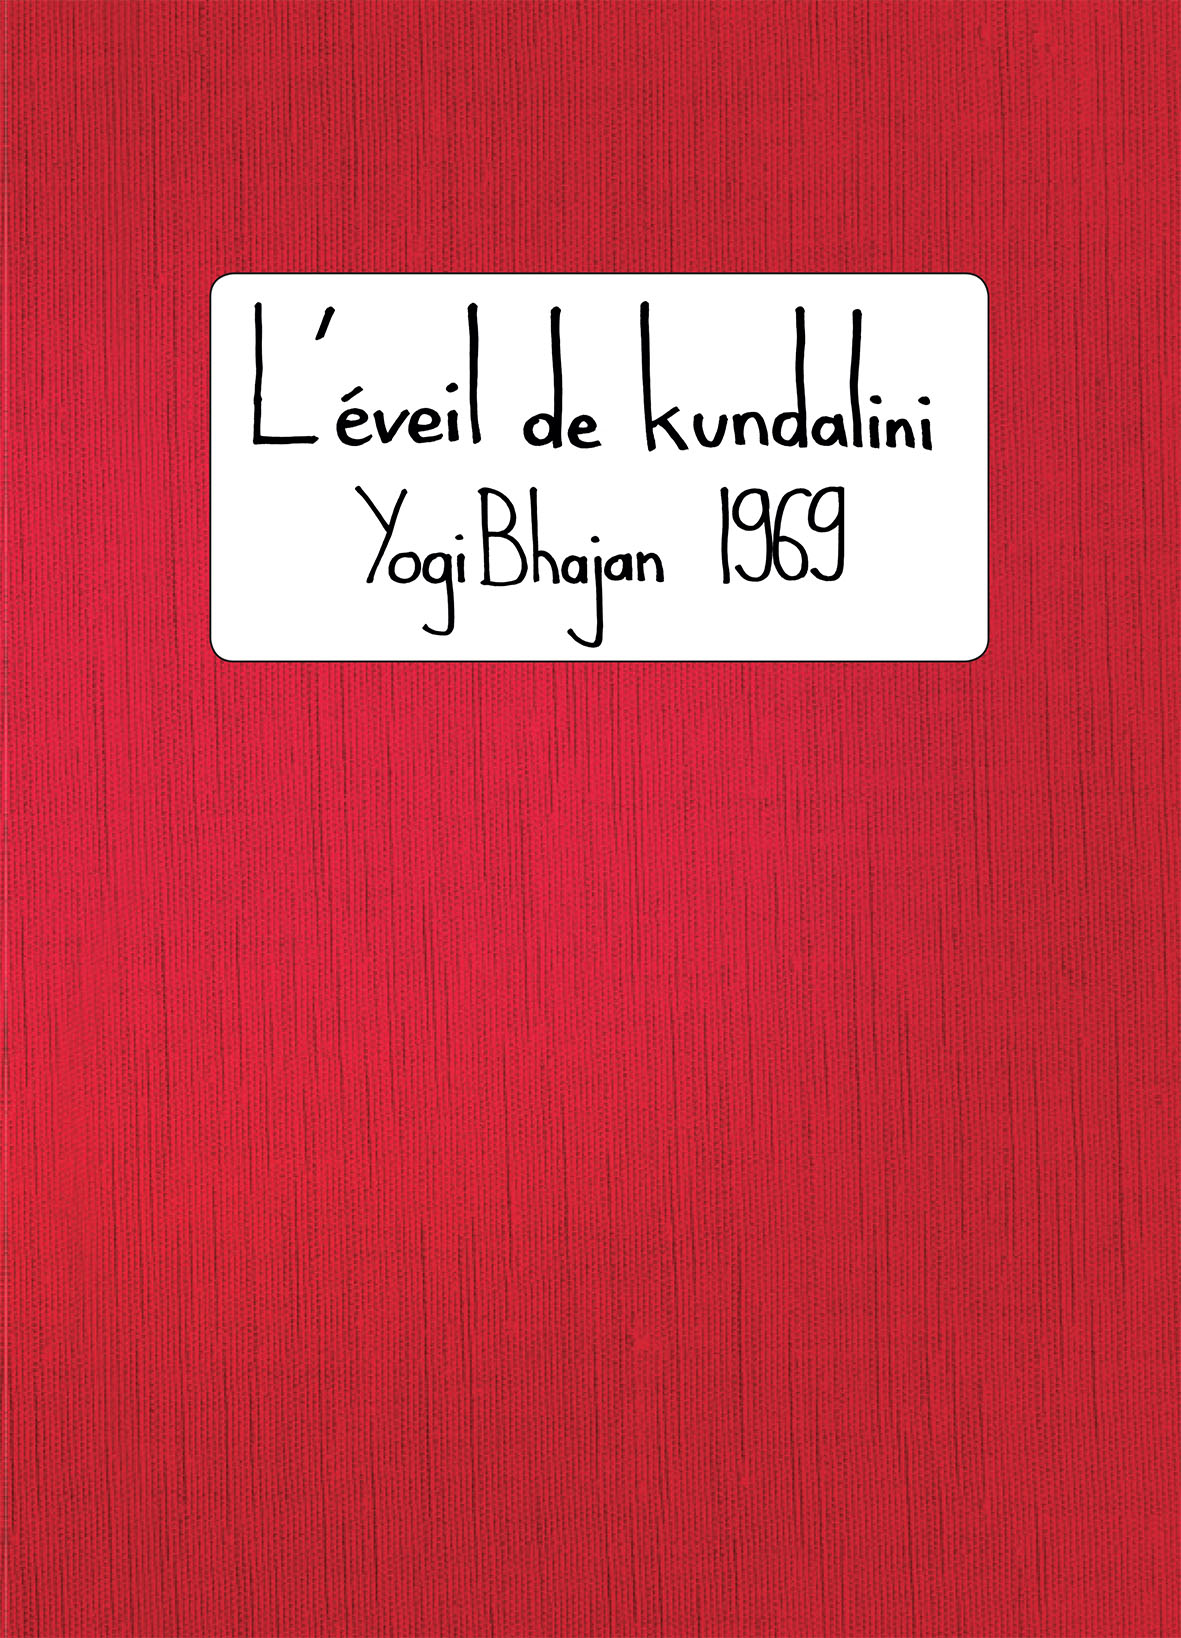 Eveil de Kundalini